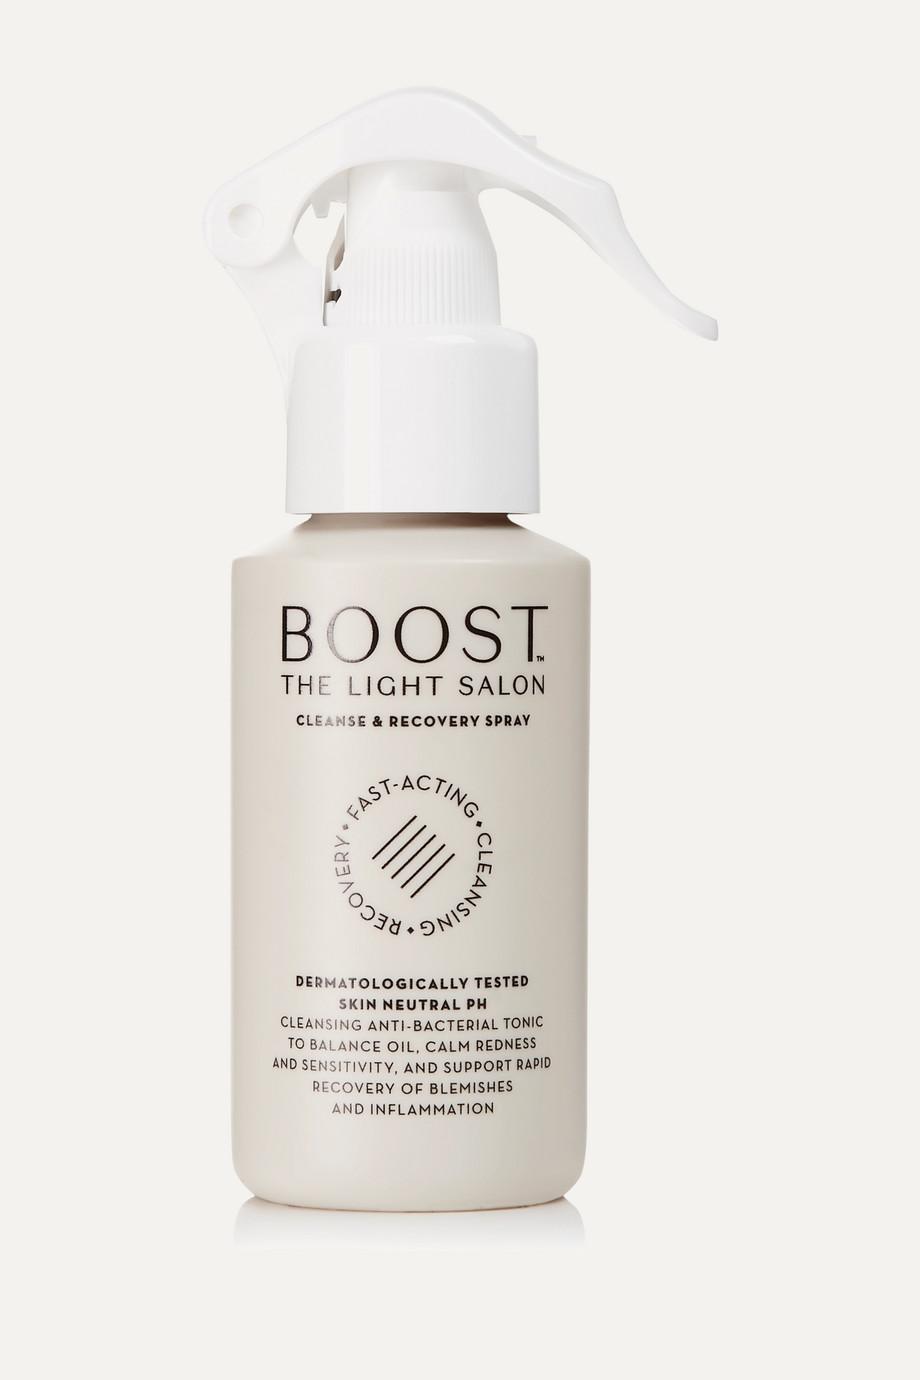 The Light Salon Cleanse & Recovery Spray, 100ml